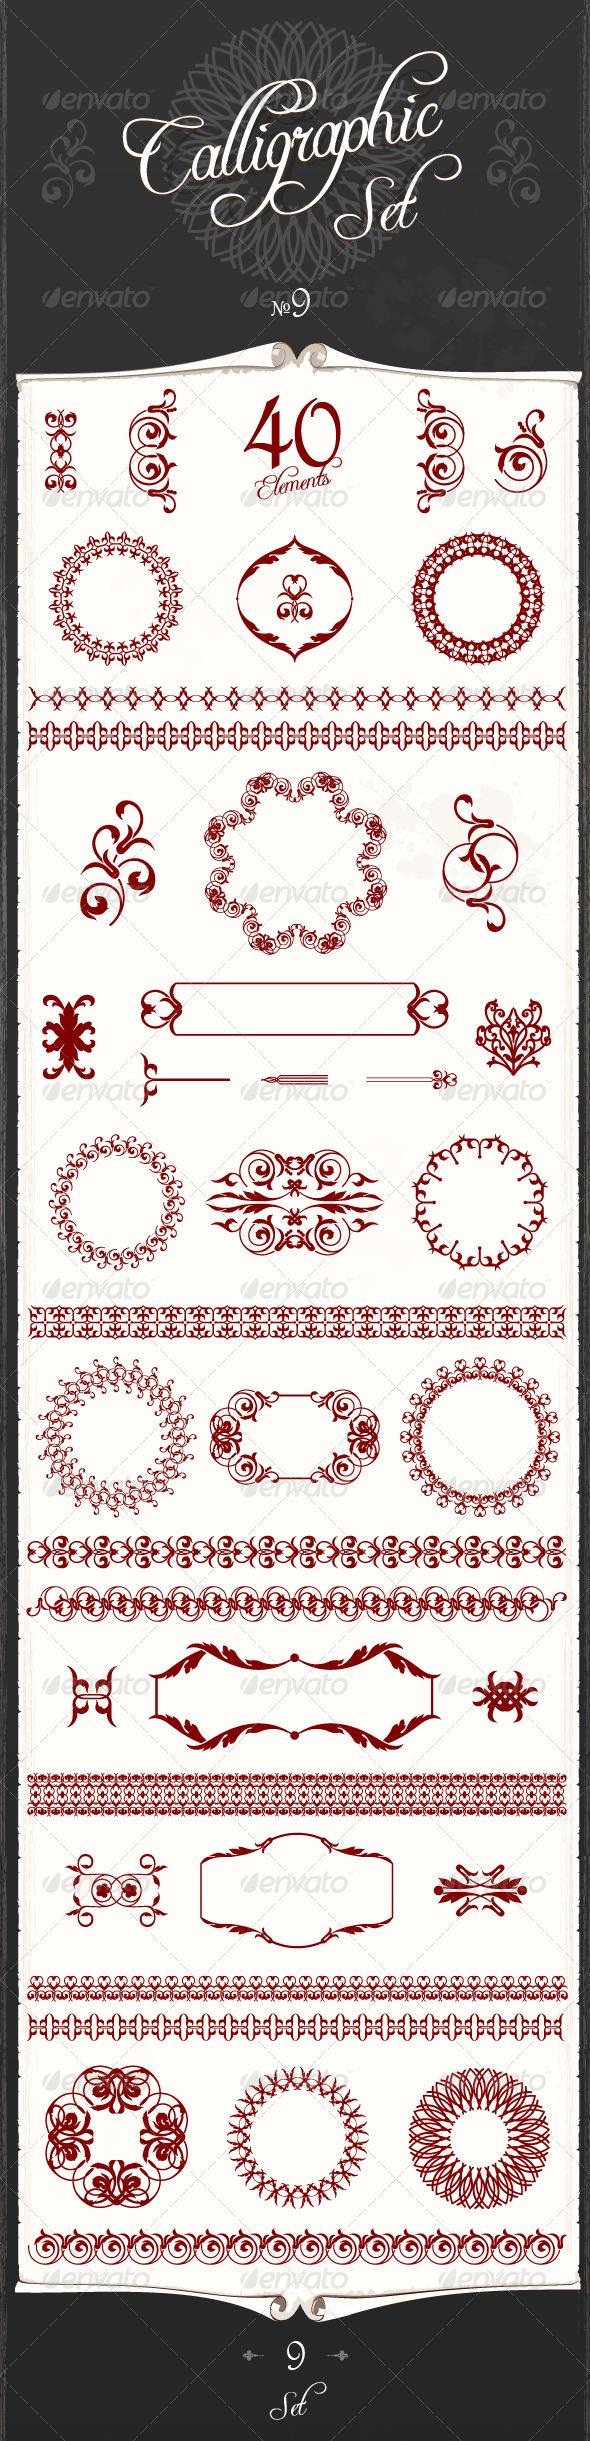 Art Calligraphic Design Set 9 - Flourishes / Swirls Decorative